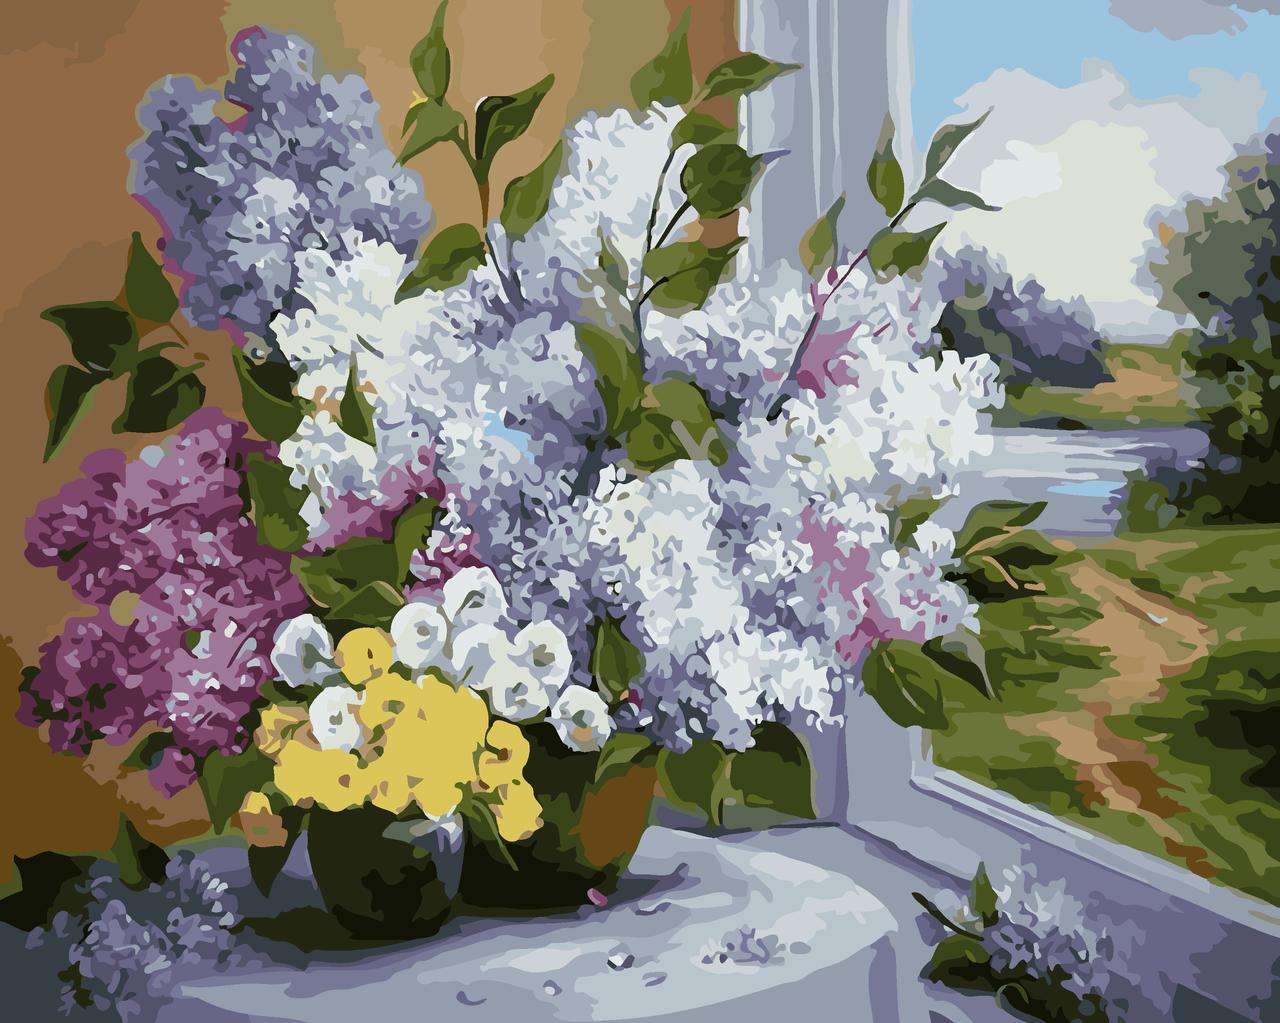 Картина по номерам Букет сирени, 40x50 см., Art Story